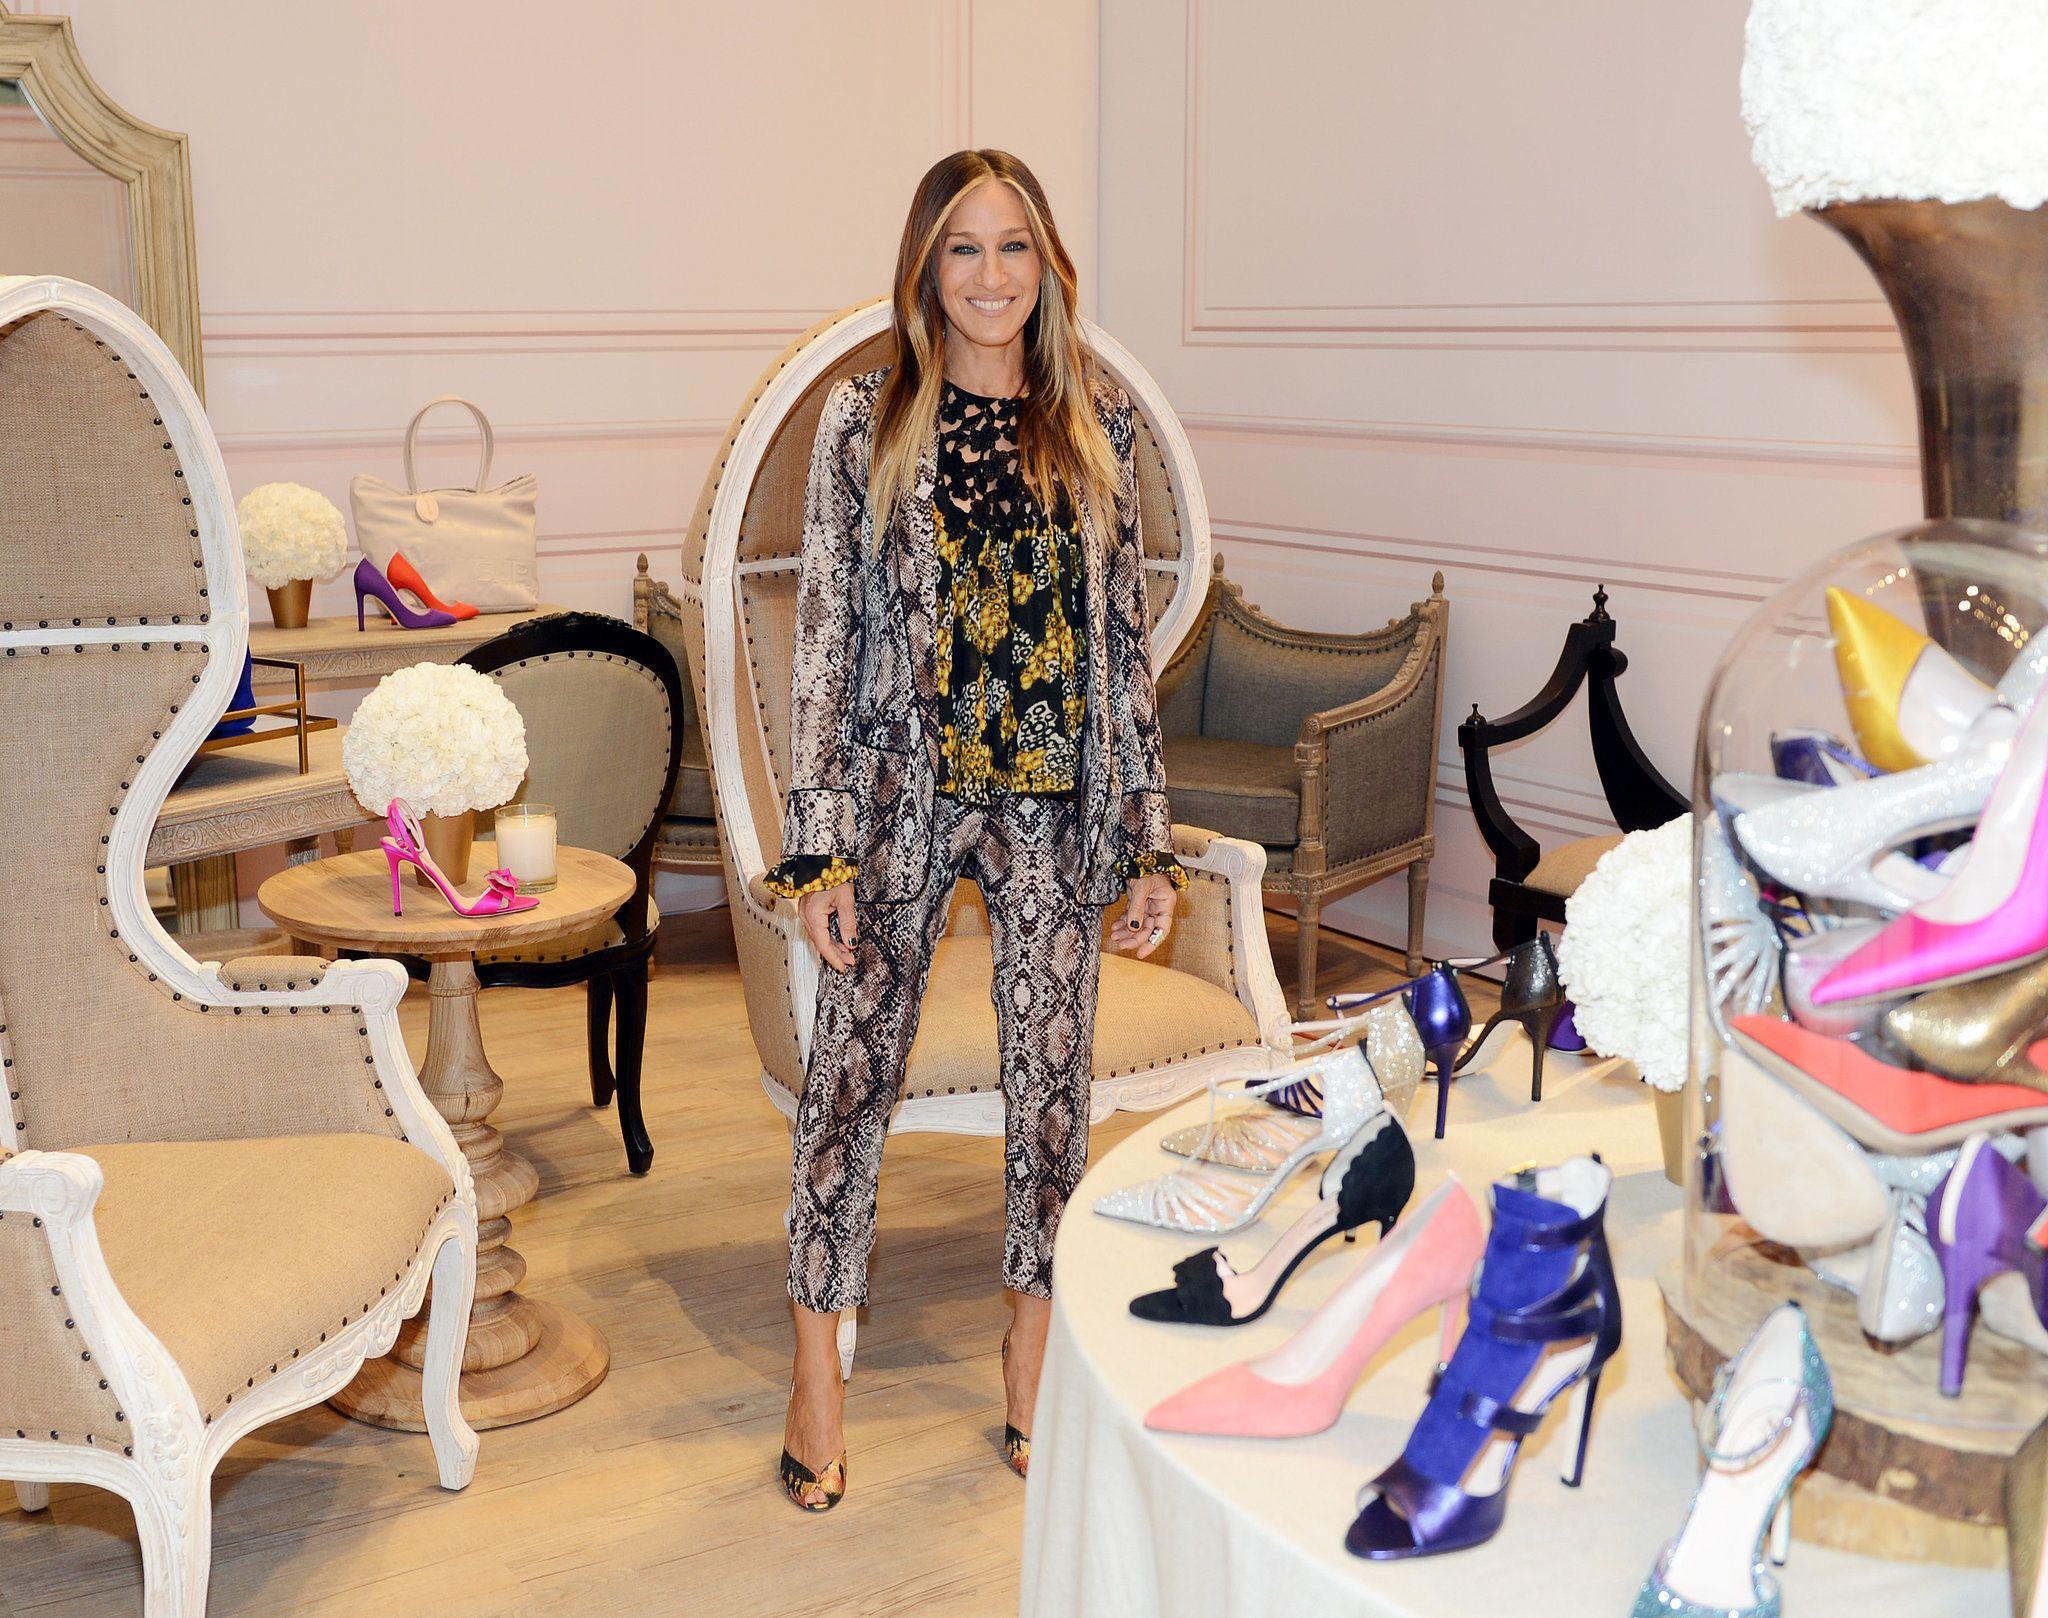 sarah-jessica-parker-high-heels